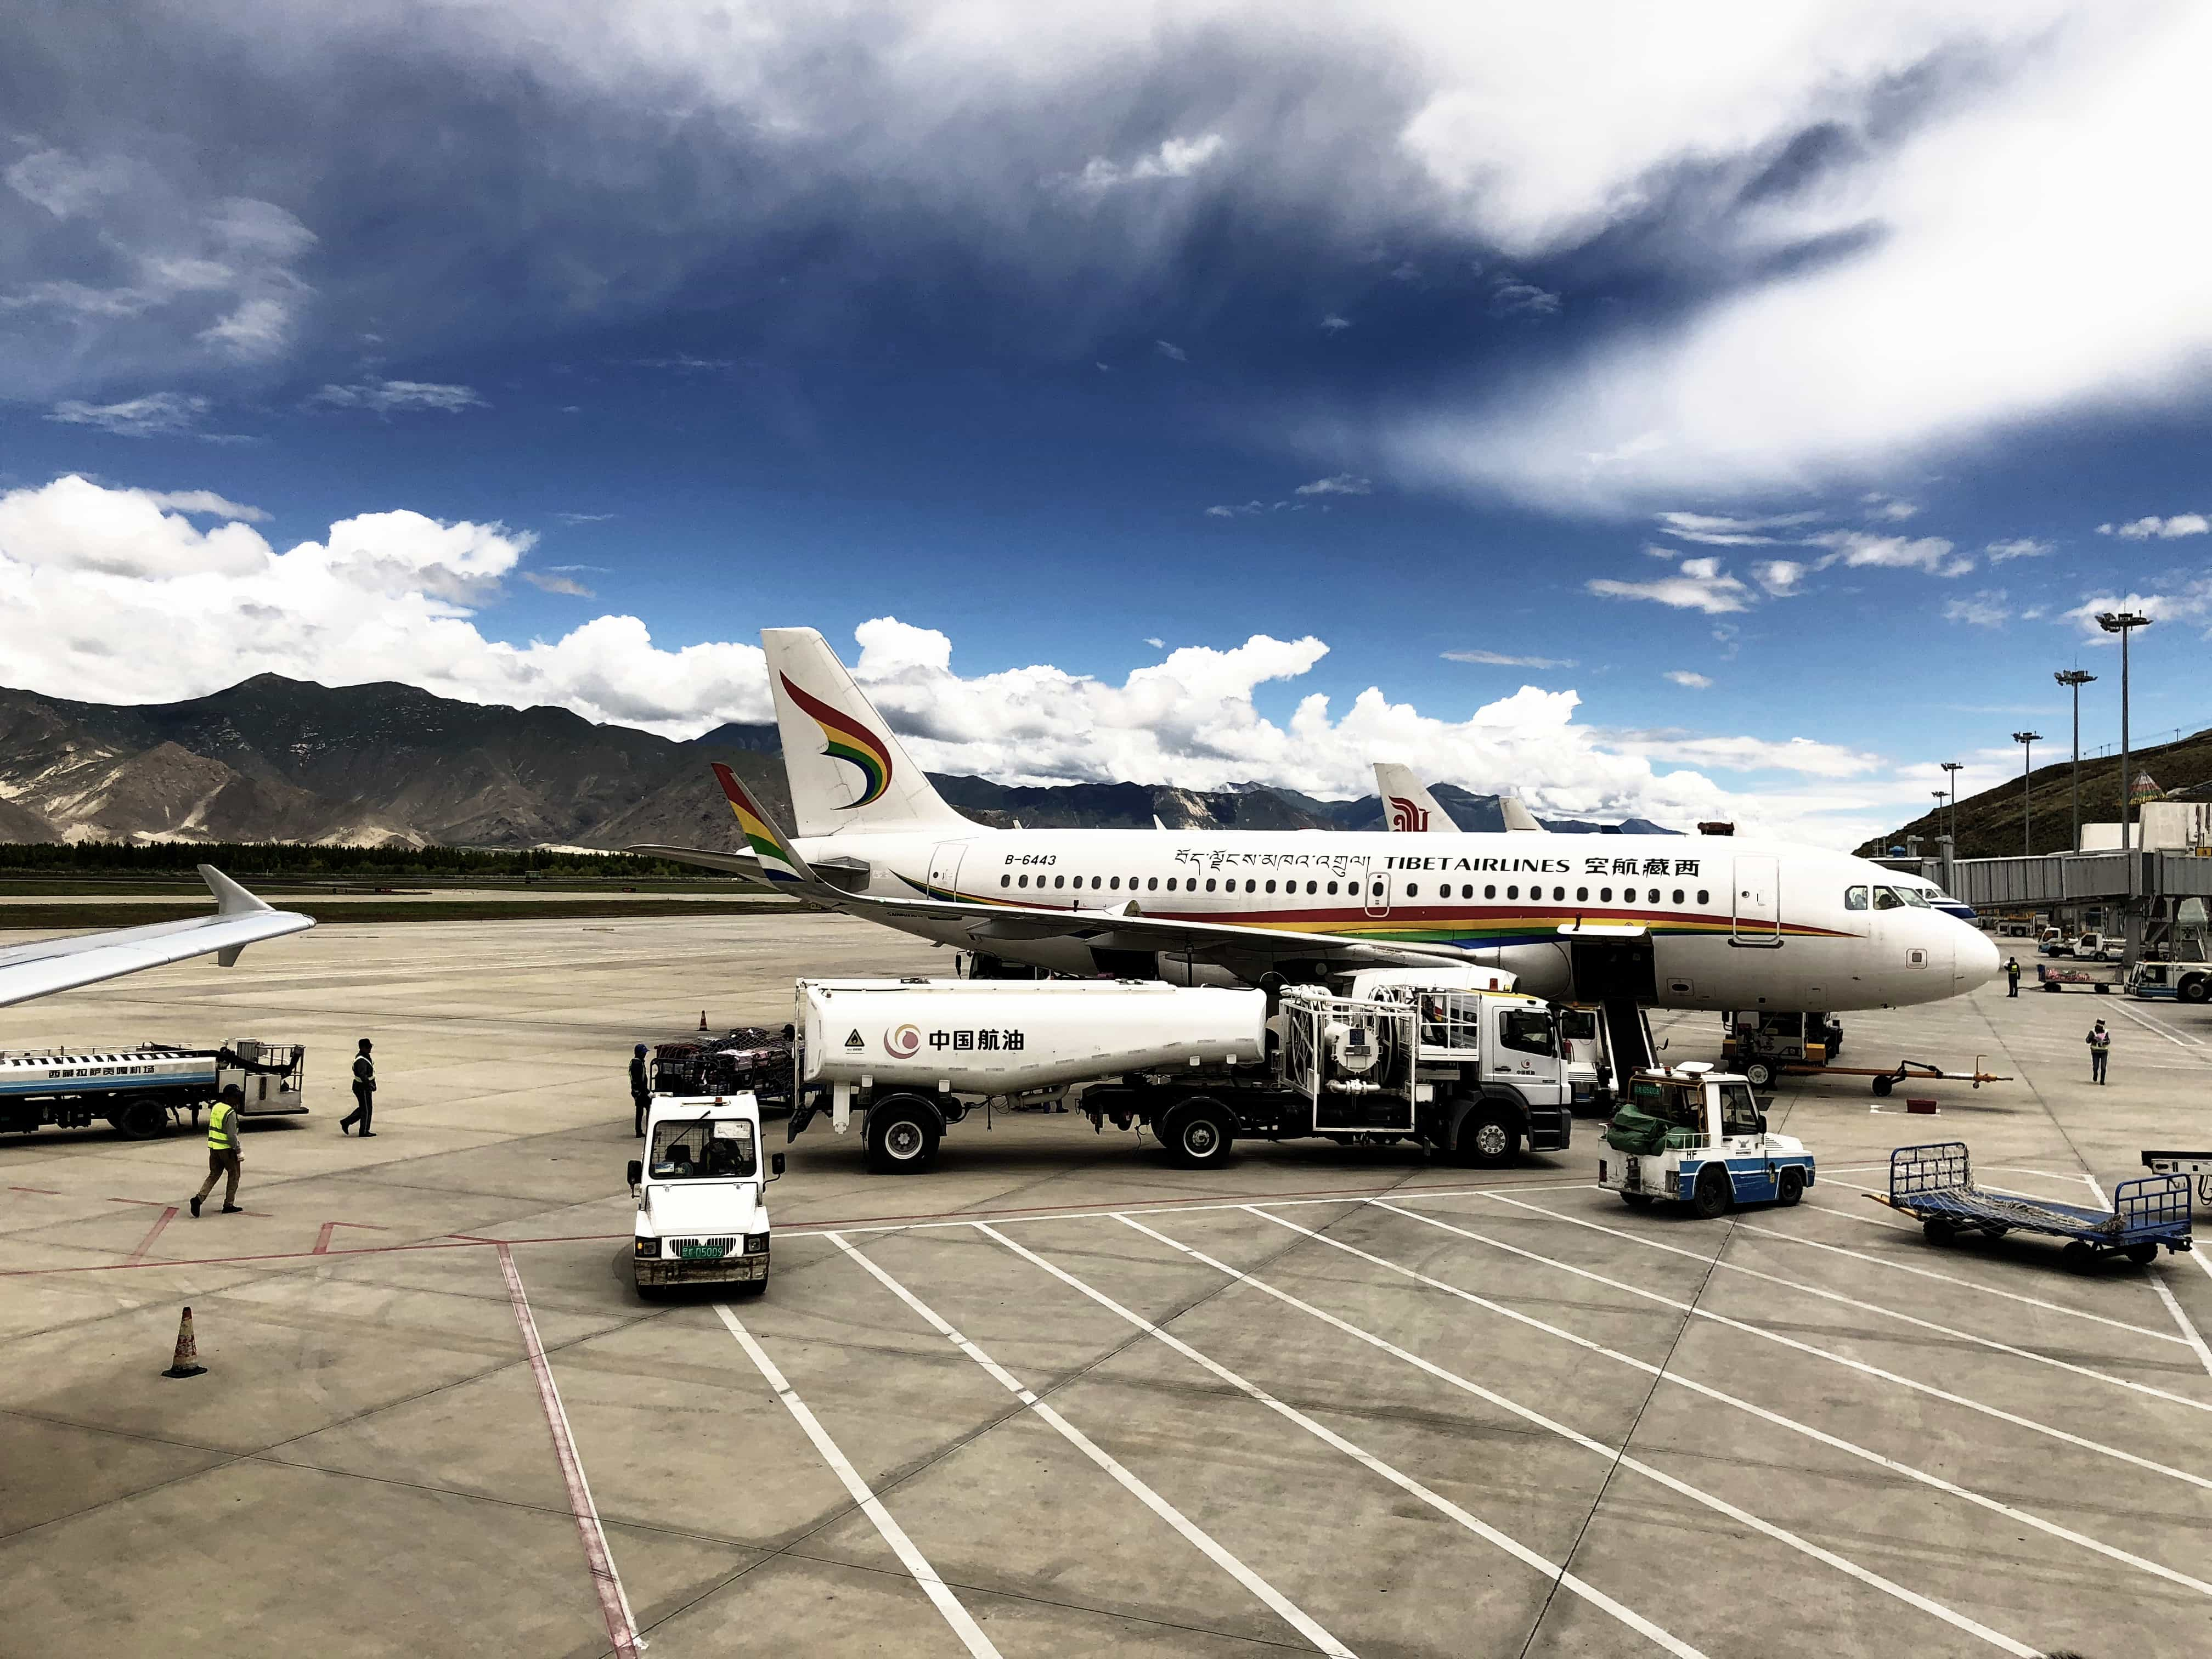 Tibetan airlines plane in Lhasa Gonggar airport in Tibet